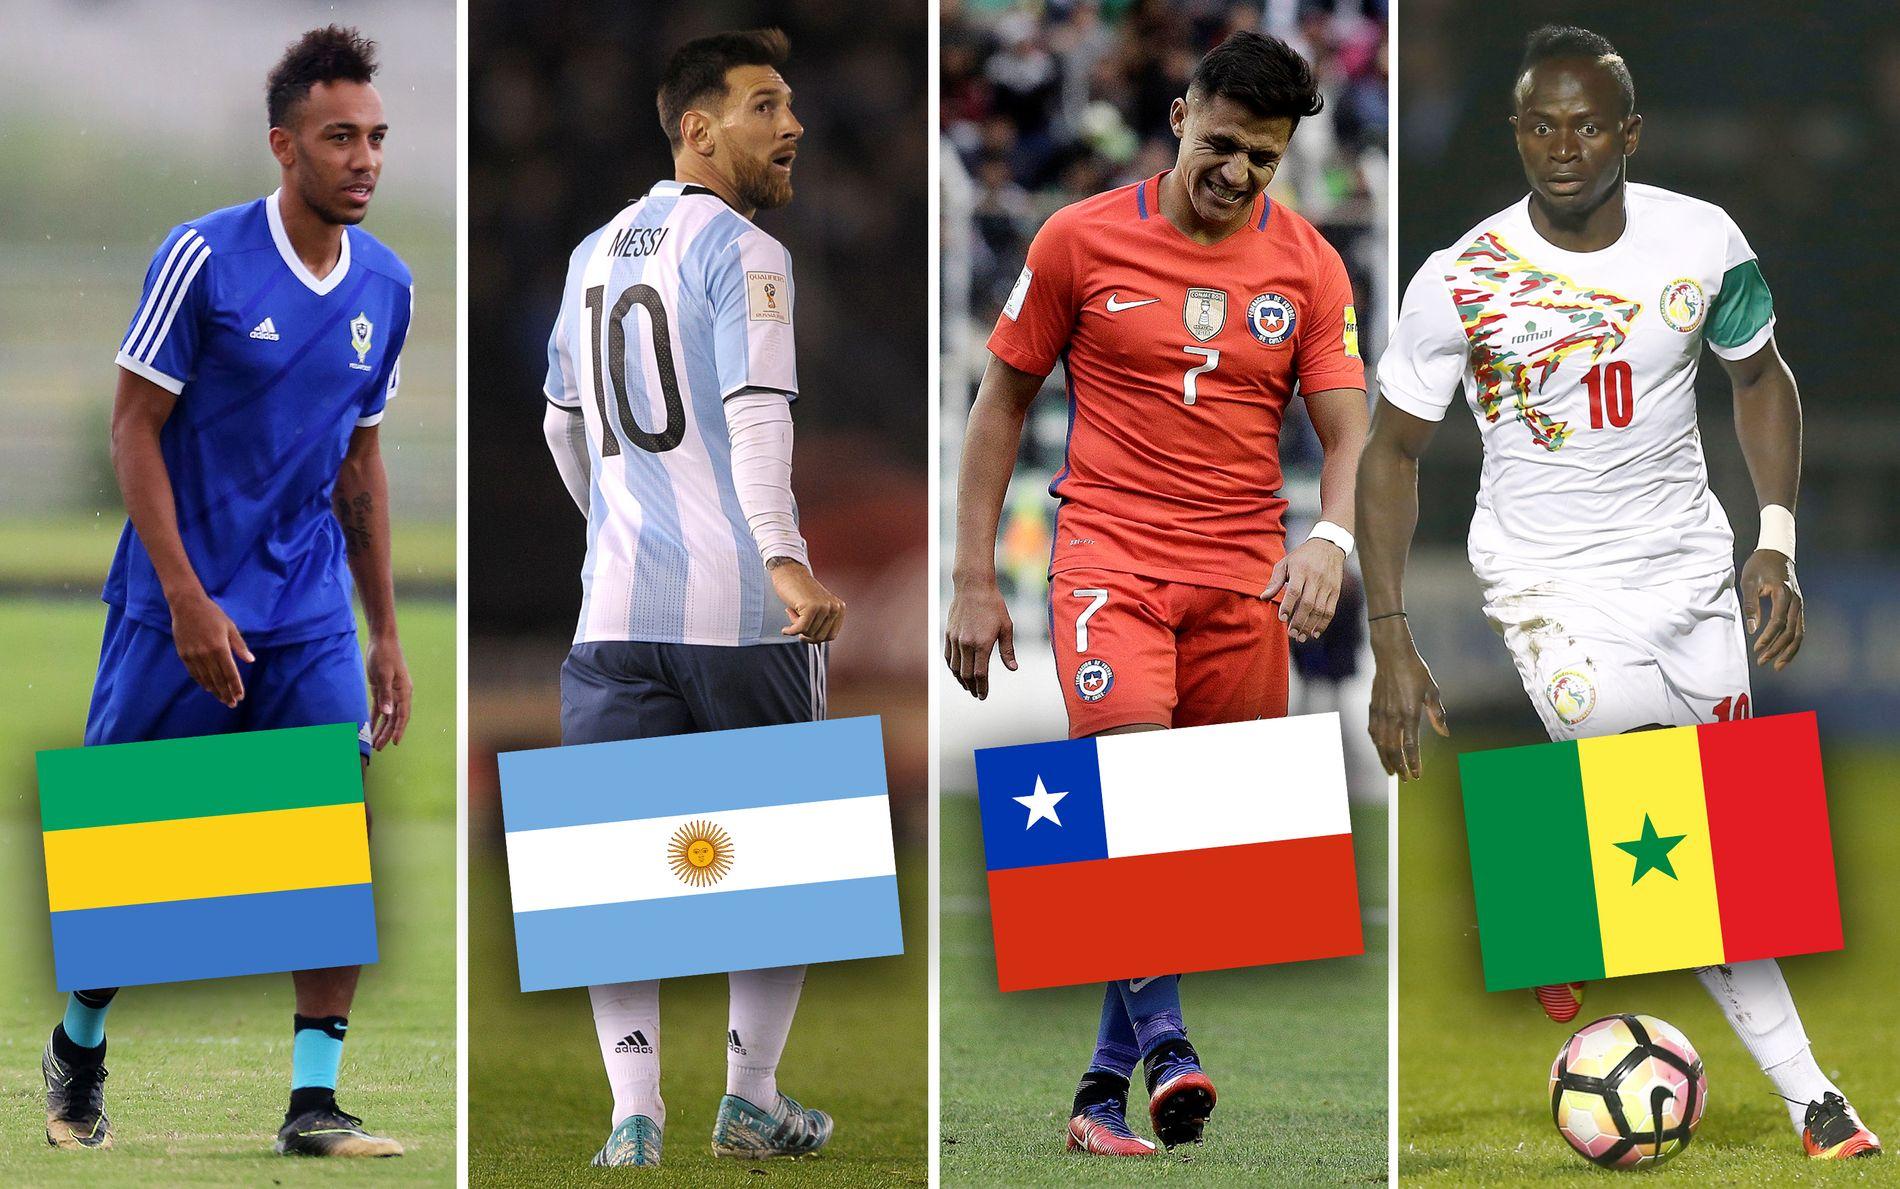 BITER NEGLER: Hverken Gabon (f.v. Pierre-Emerick Aubameyang), Argentina (Lionel Messi), Chile (Alexis Sánchez) eller Senegal (Sadio Mané) er sikret plass i neste års VM.